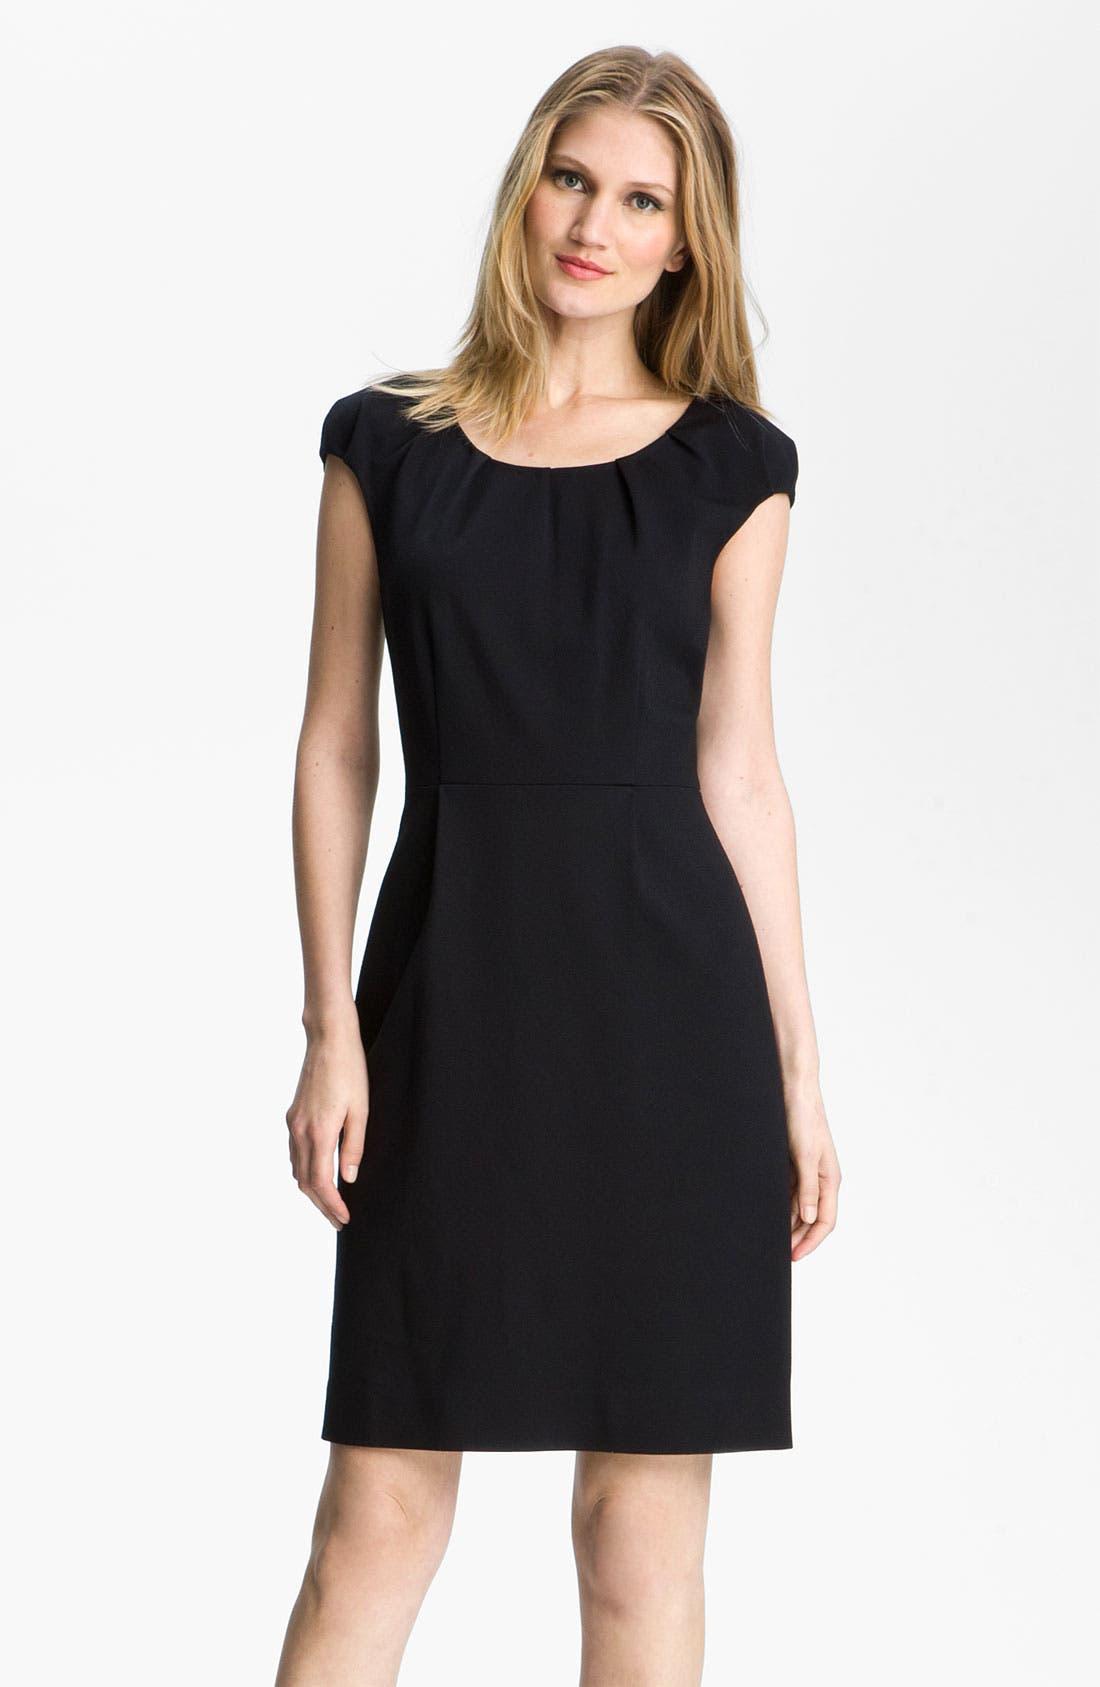 Alternate Image 1 Selected - kate spade new york 'taylor' sheath dress